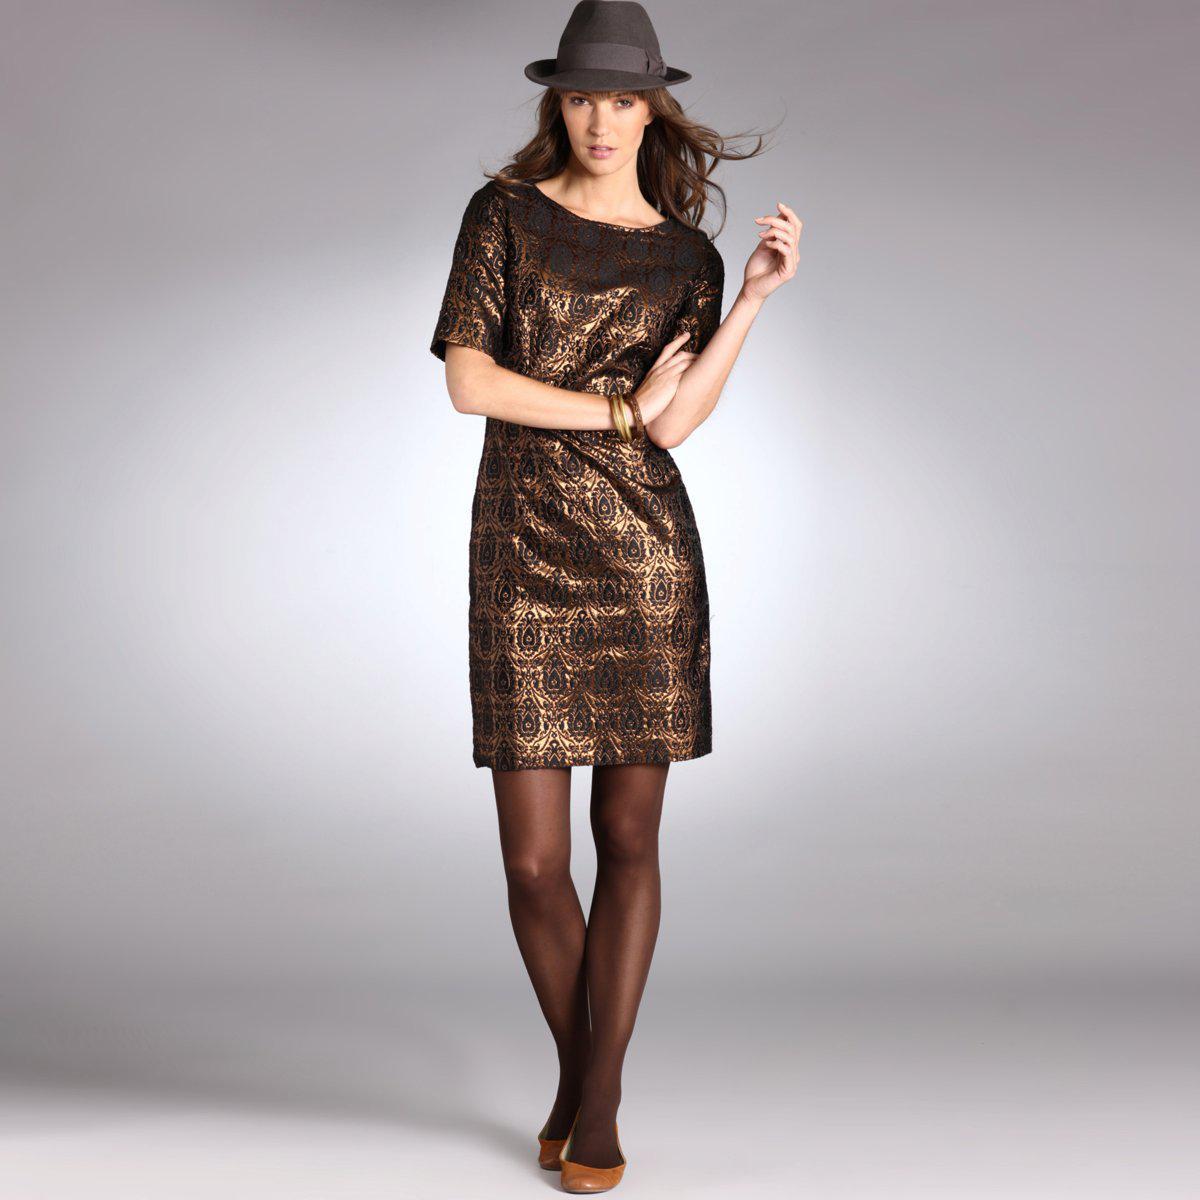 bradyna foremata 239 - Βραδυνα Φορεματα LaRedoute Φθινόπωρο 2011 Κωδ. 324219949